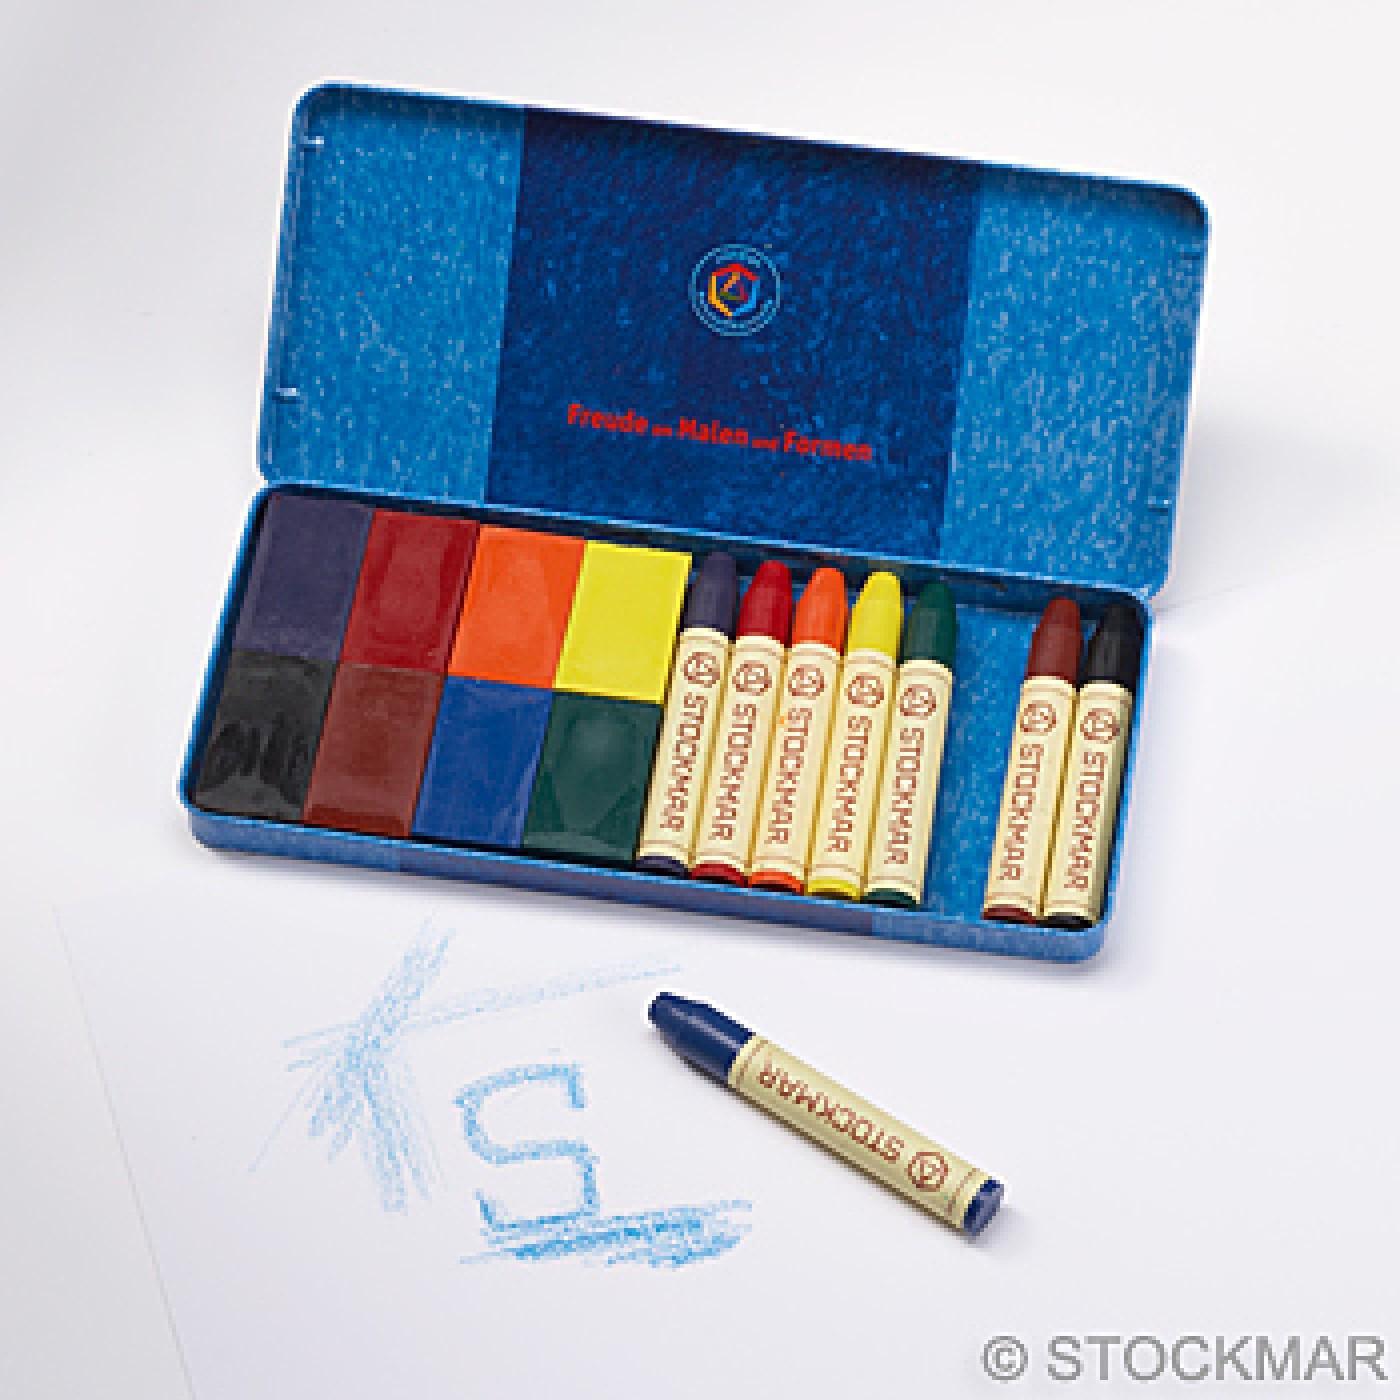 Stockmar Beeswax Crayons - 8 Sticks + 8 Blocks